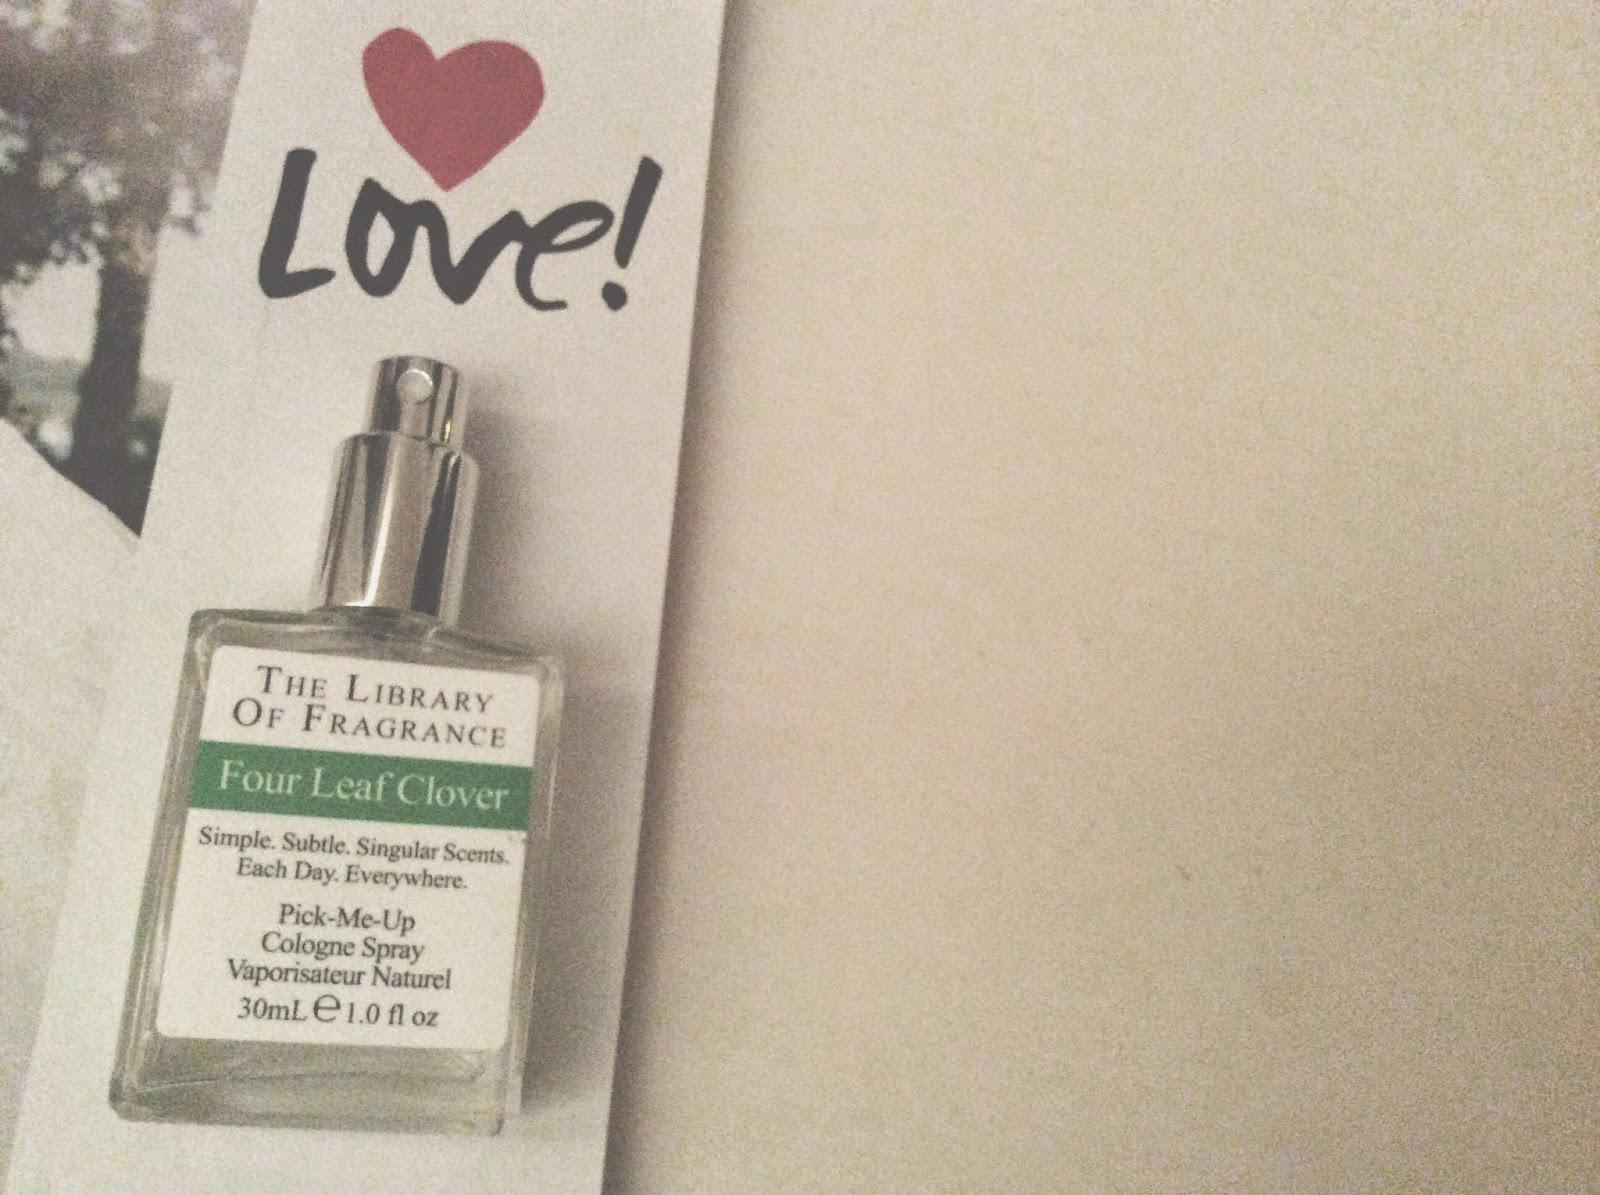 Library of Fragrance Four Leaf Clover perfume